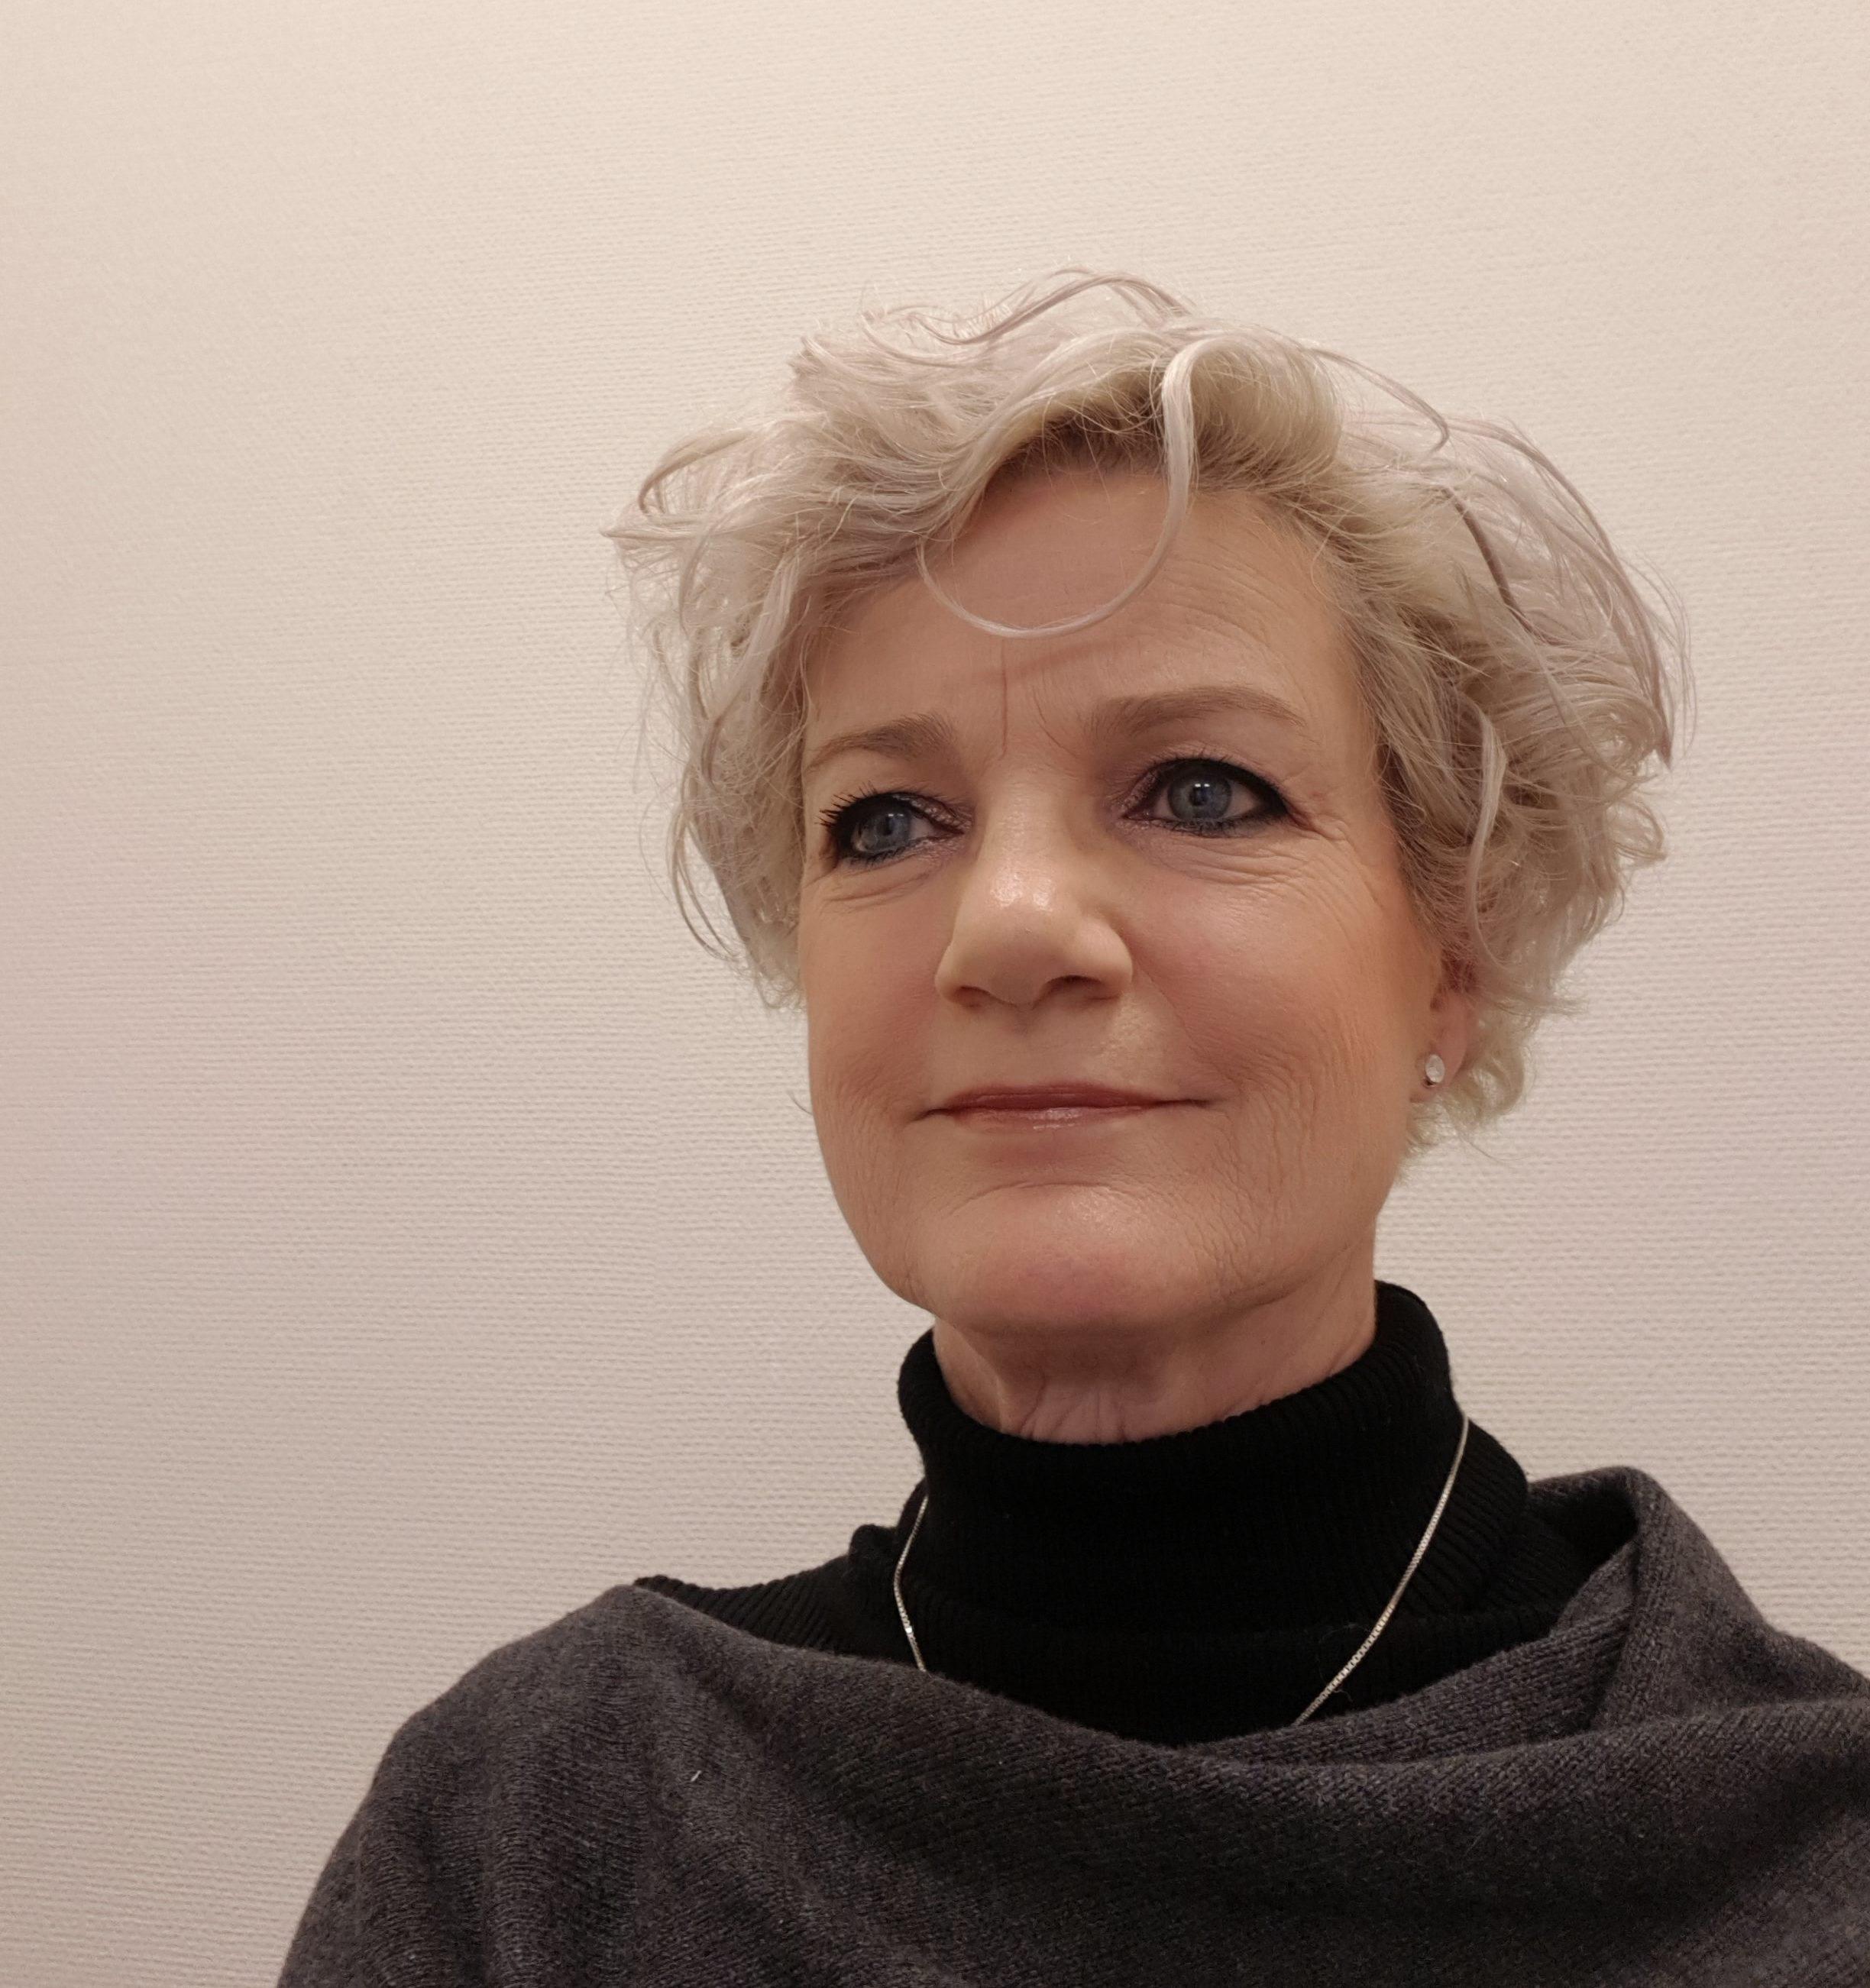 Mevr. R.J.M. (Renate) Bökkerink